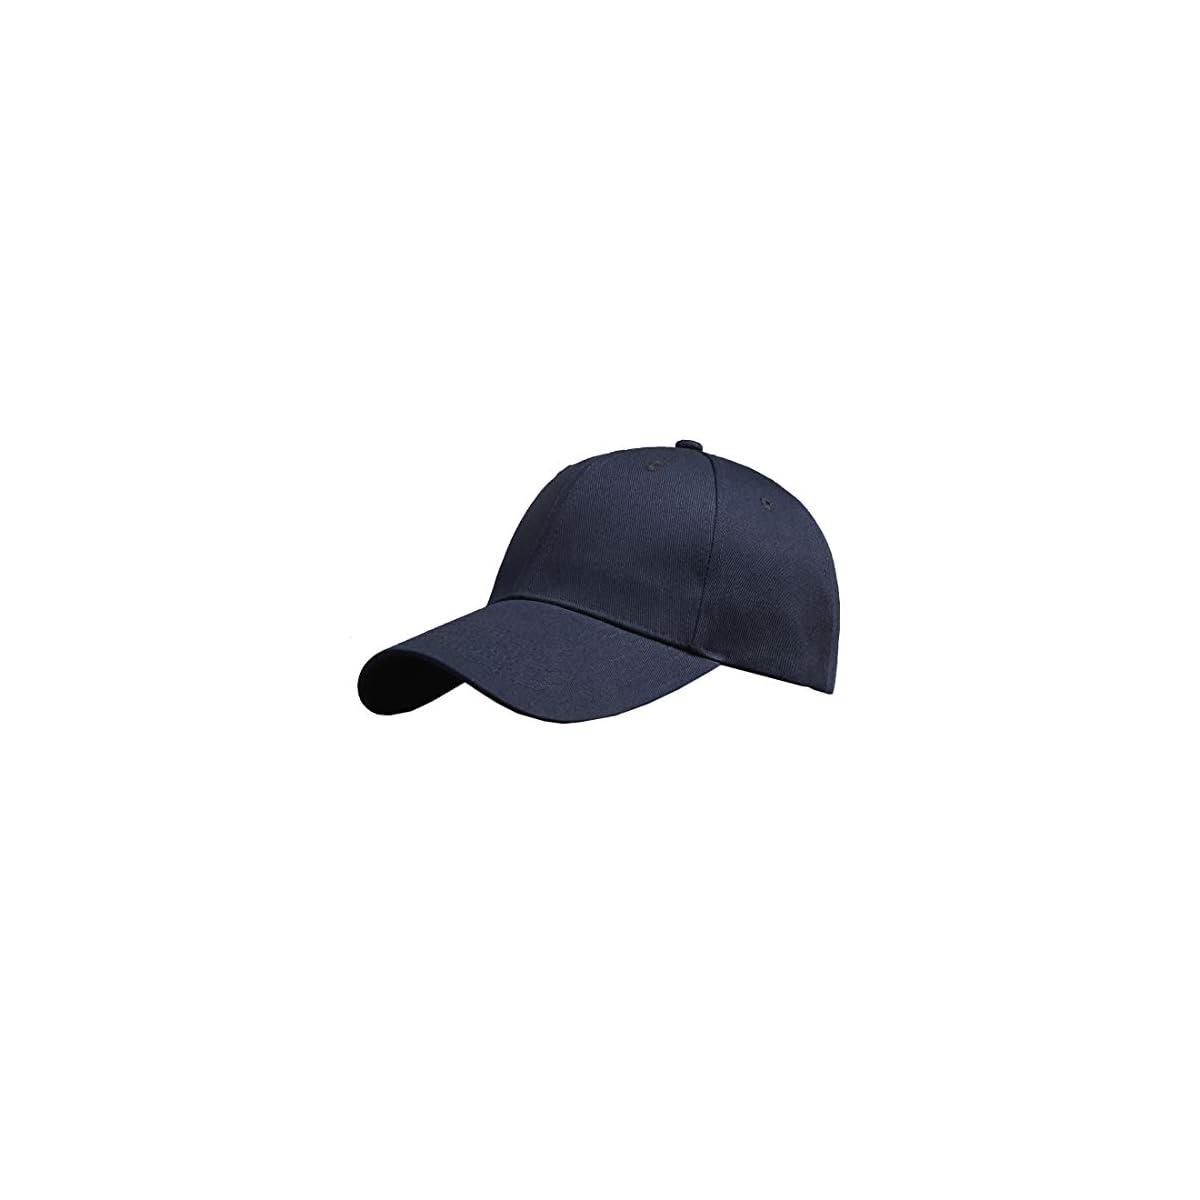 4955755772061b KeepSa Baumwolle Baseball Cap, Basecap Unisex Baseball Kappen ...